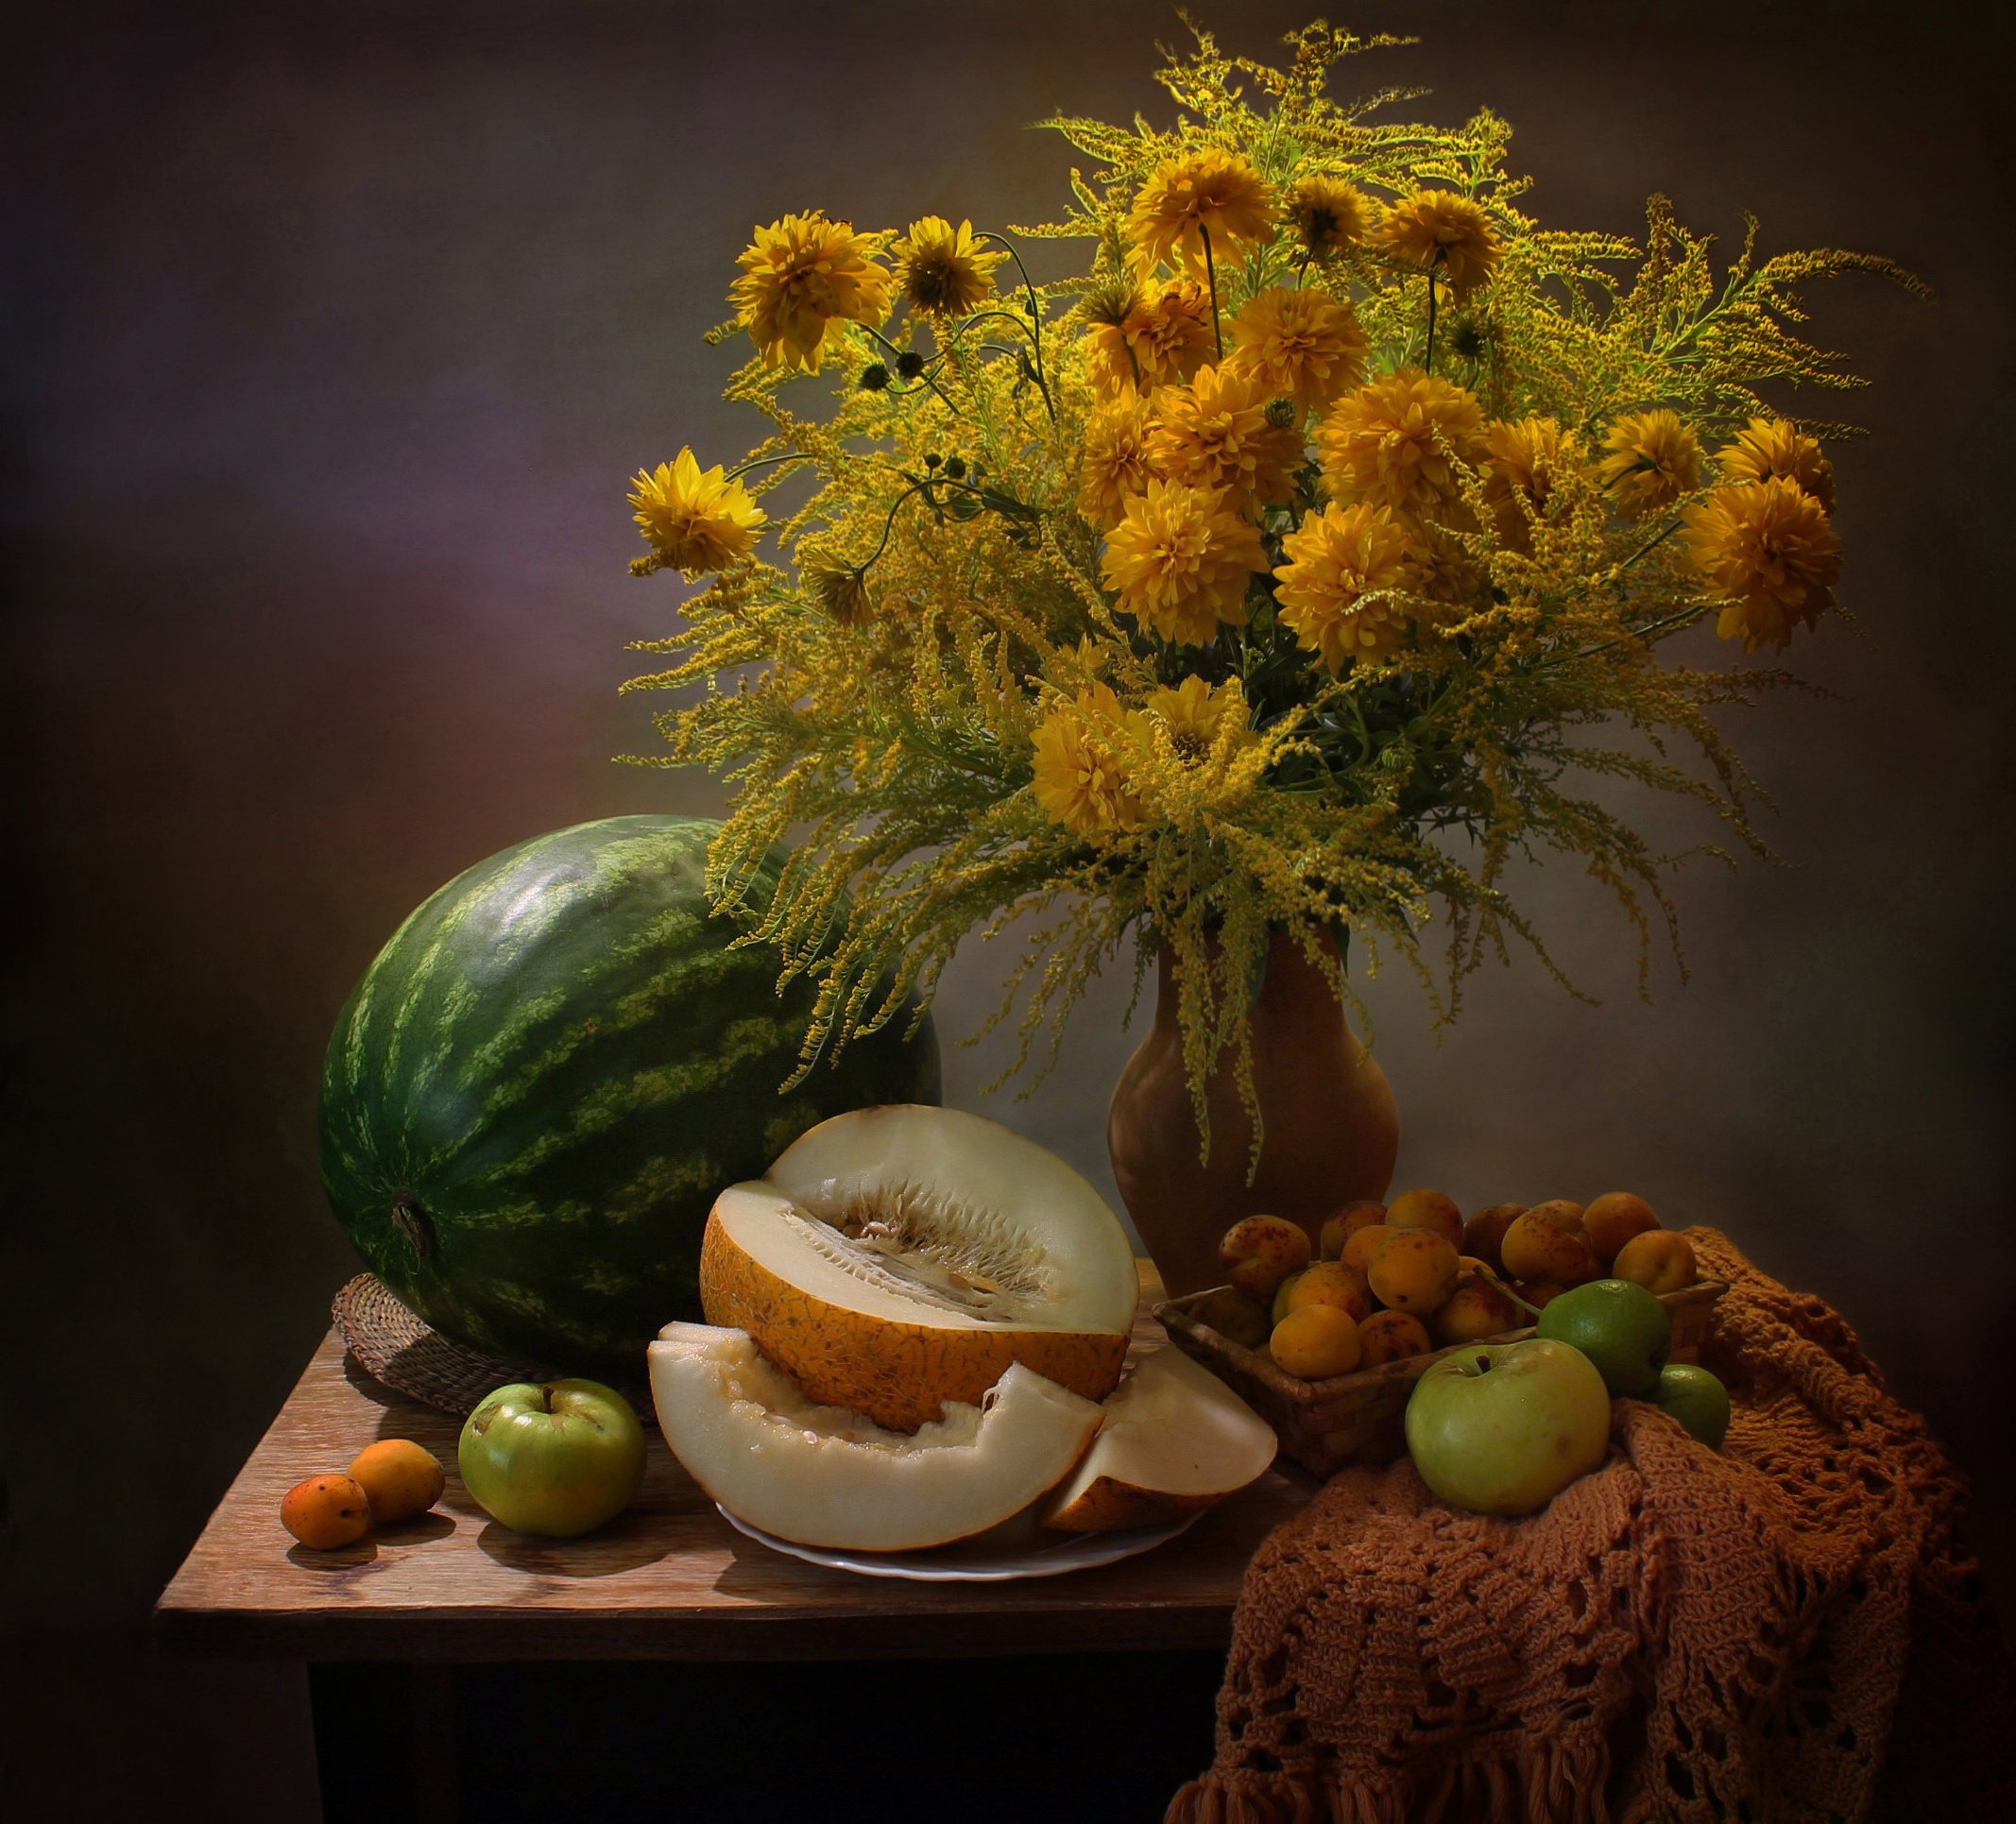 лето, натюрморт, цветы, фрукты, арбуз, дыня, Ковалева Светлана